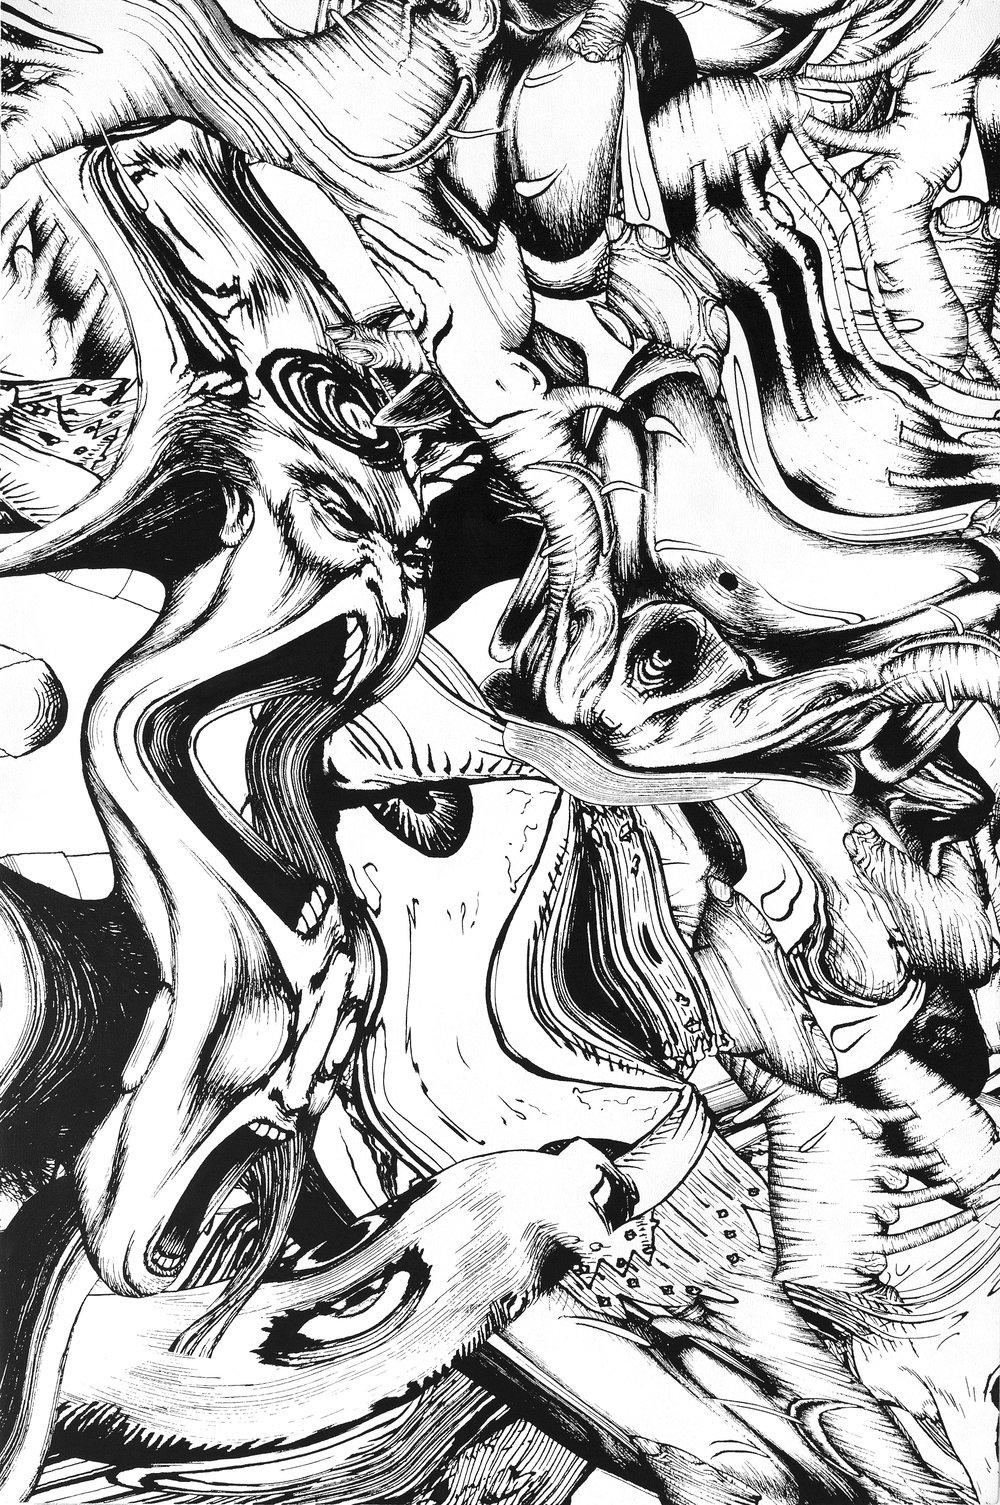 Chaos (Paris 2), 2017 silkscreen on canvas 59 1/2 x 39 1/2 in - 151,1 x 100,3 cm